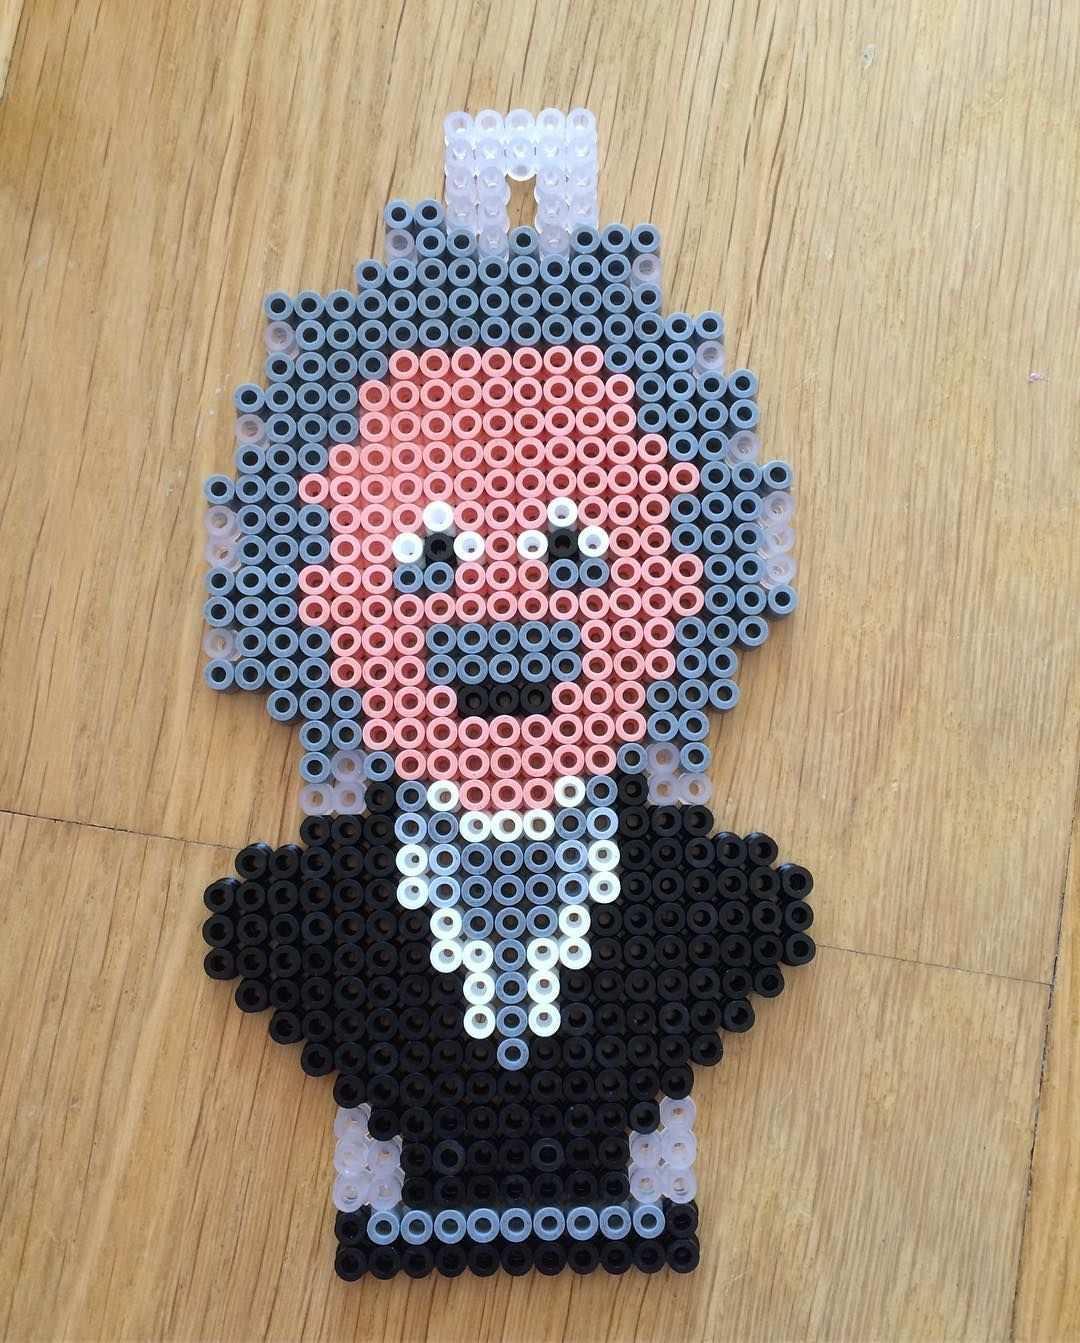 Albert Einstein Perler Beads By Mathildas Perler Beads Basteln Bugelperlen Bugelperlen Vorlagen Bugelperlen